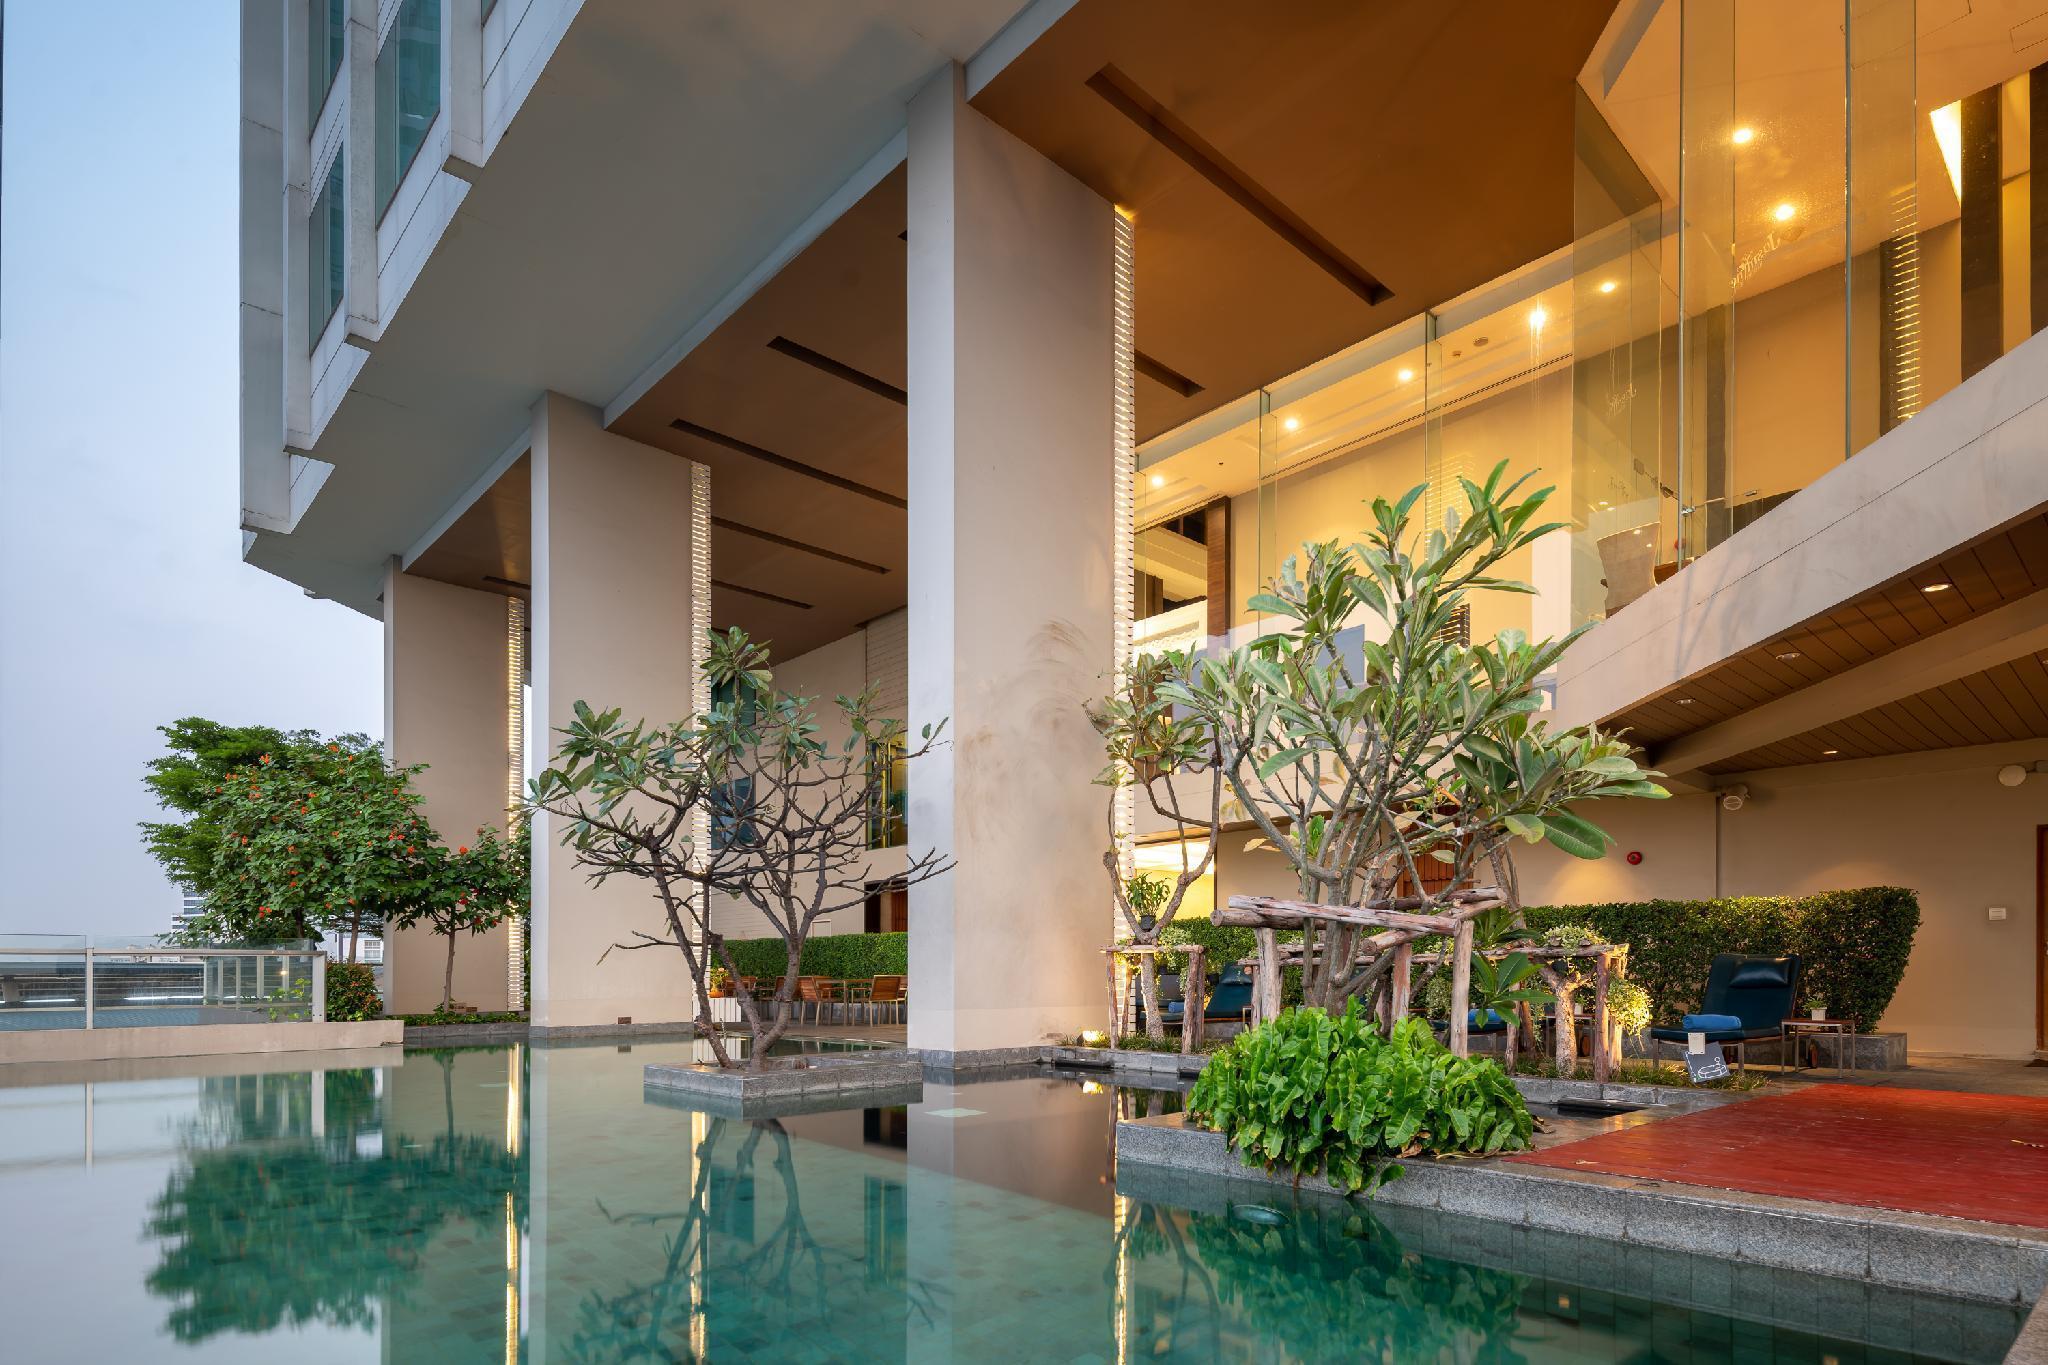 Jasmine Resort Hotel จัสมิน รีสอร์ท โฮเต็ล